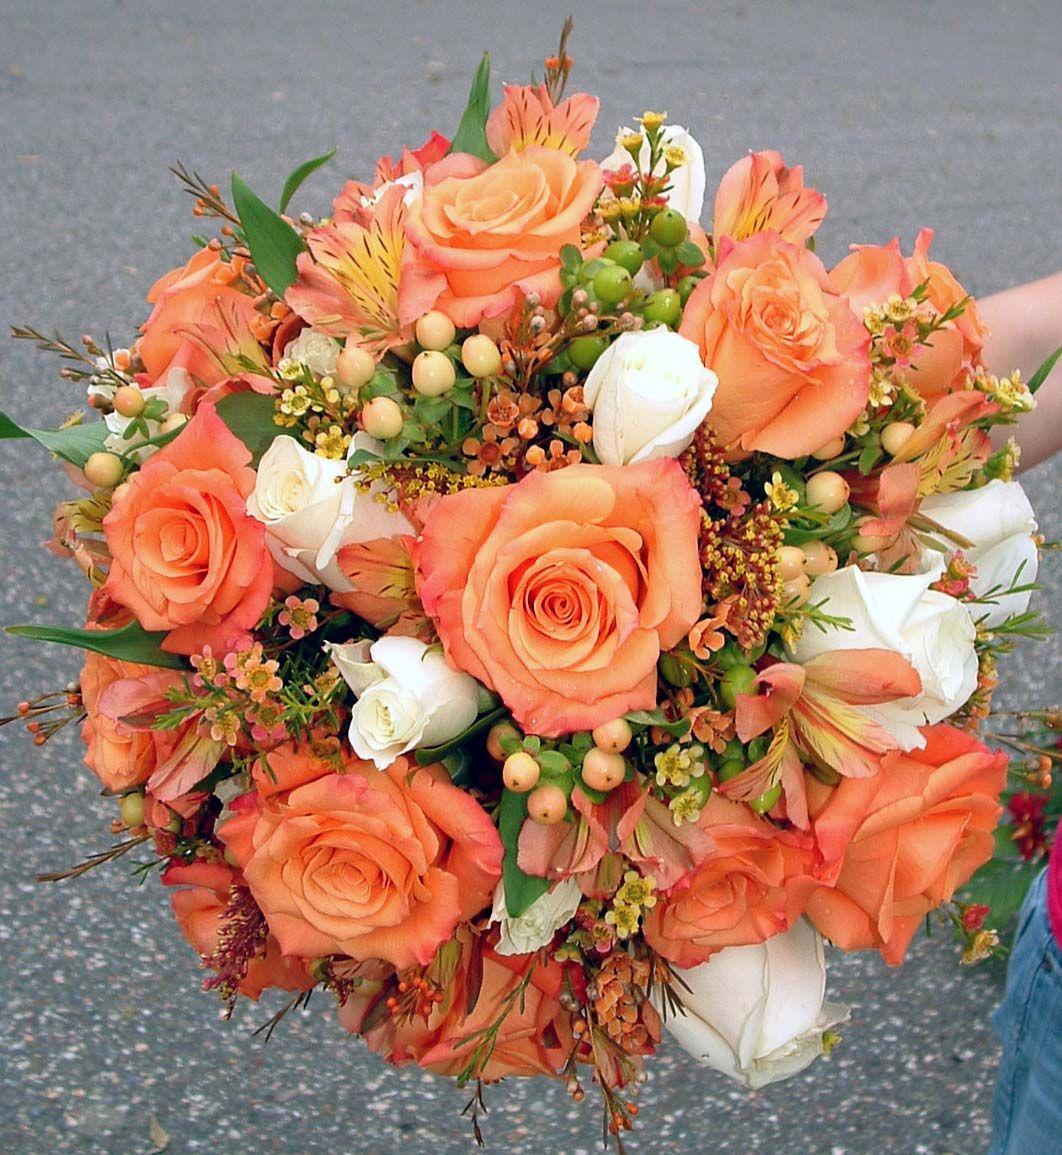 Orange Flower Arrangements For Weddings: Orange And Ivory Rose, Hypericum, And Waxflower Bridal